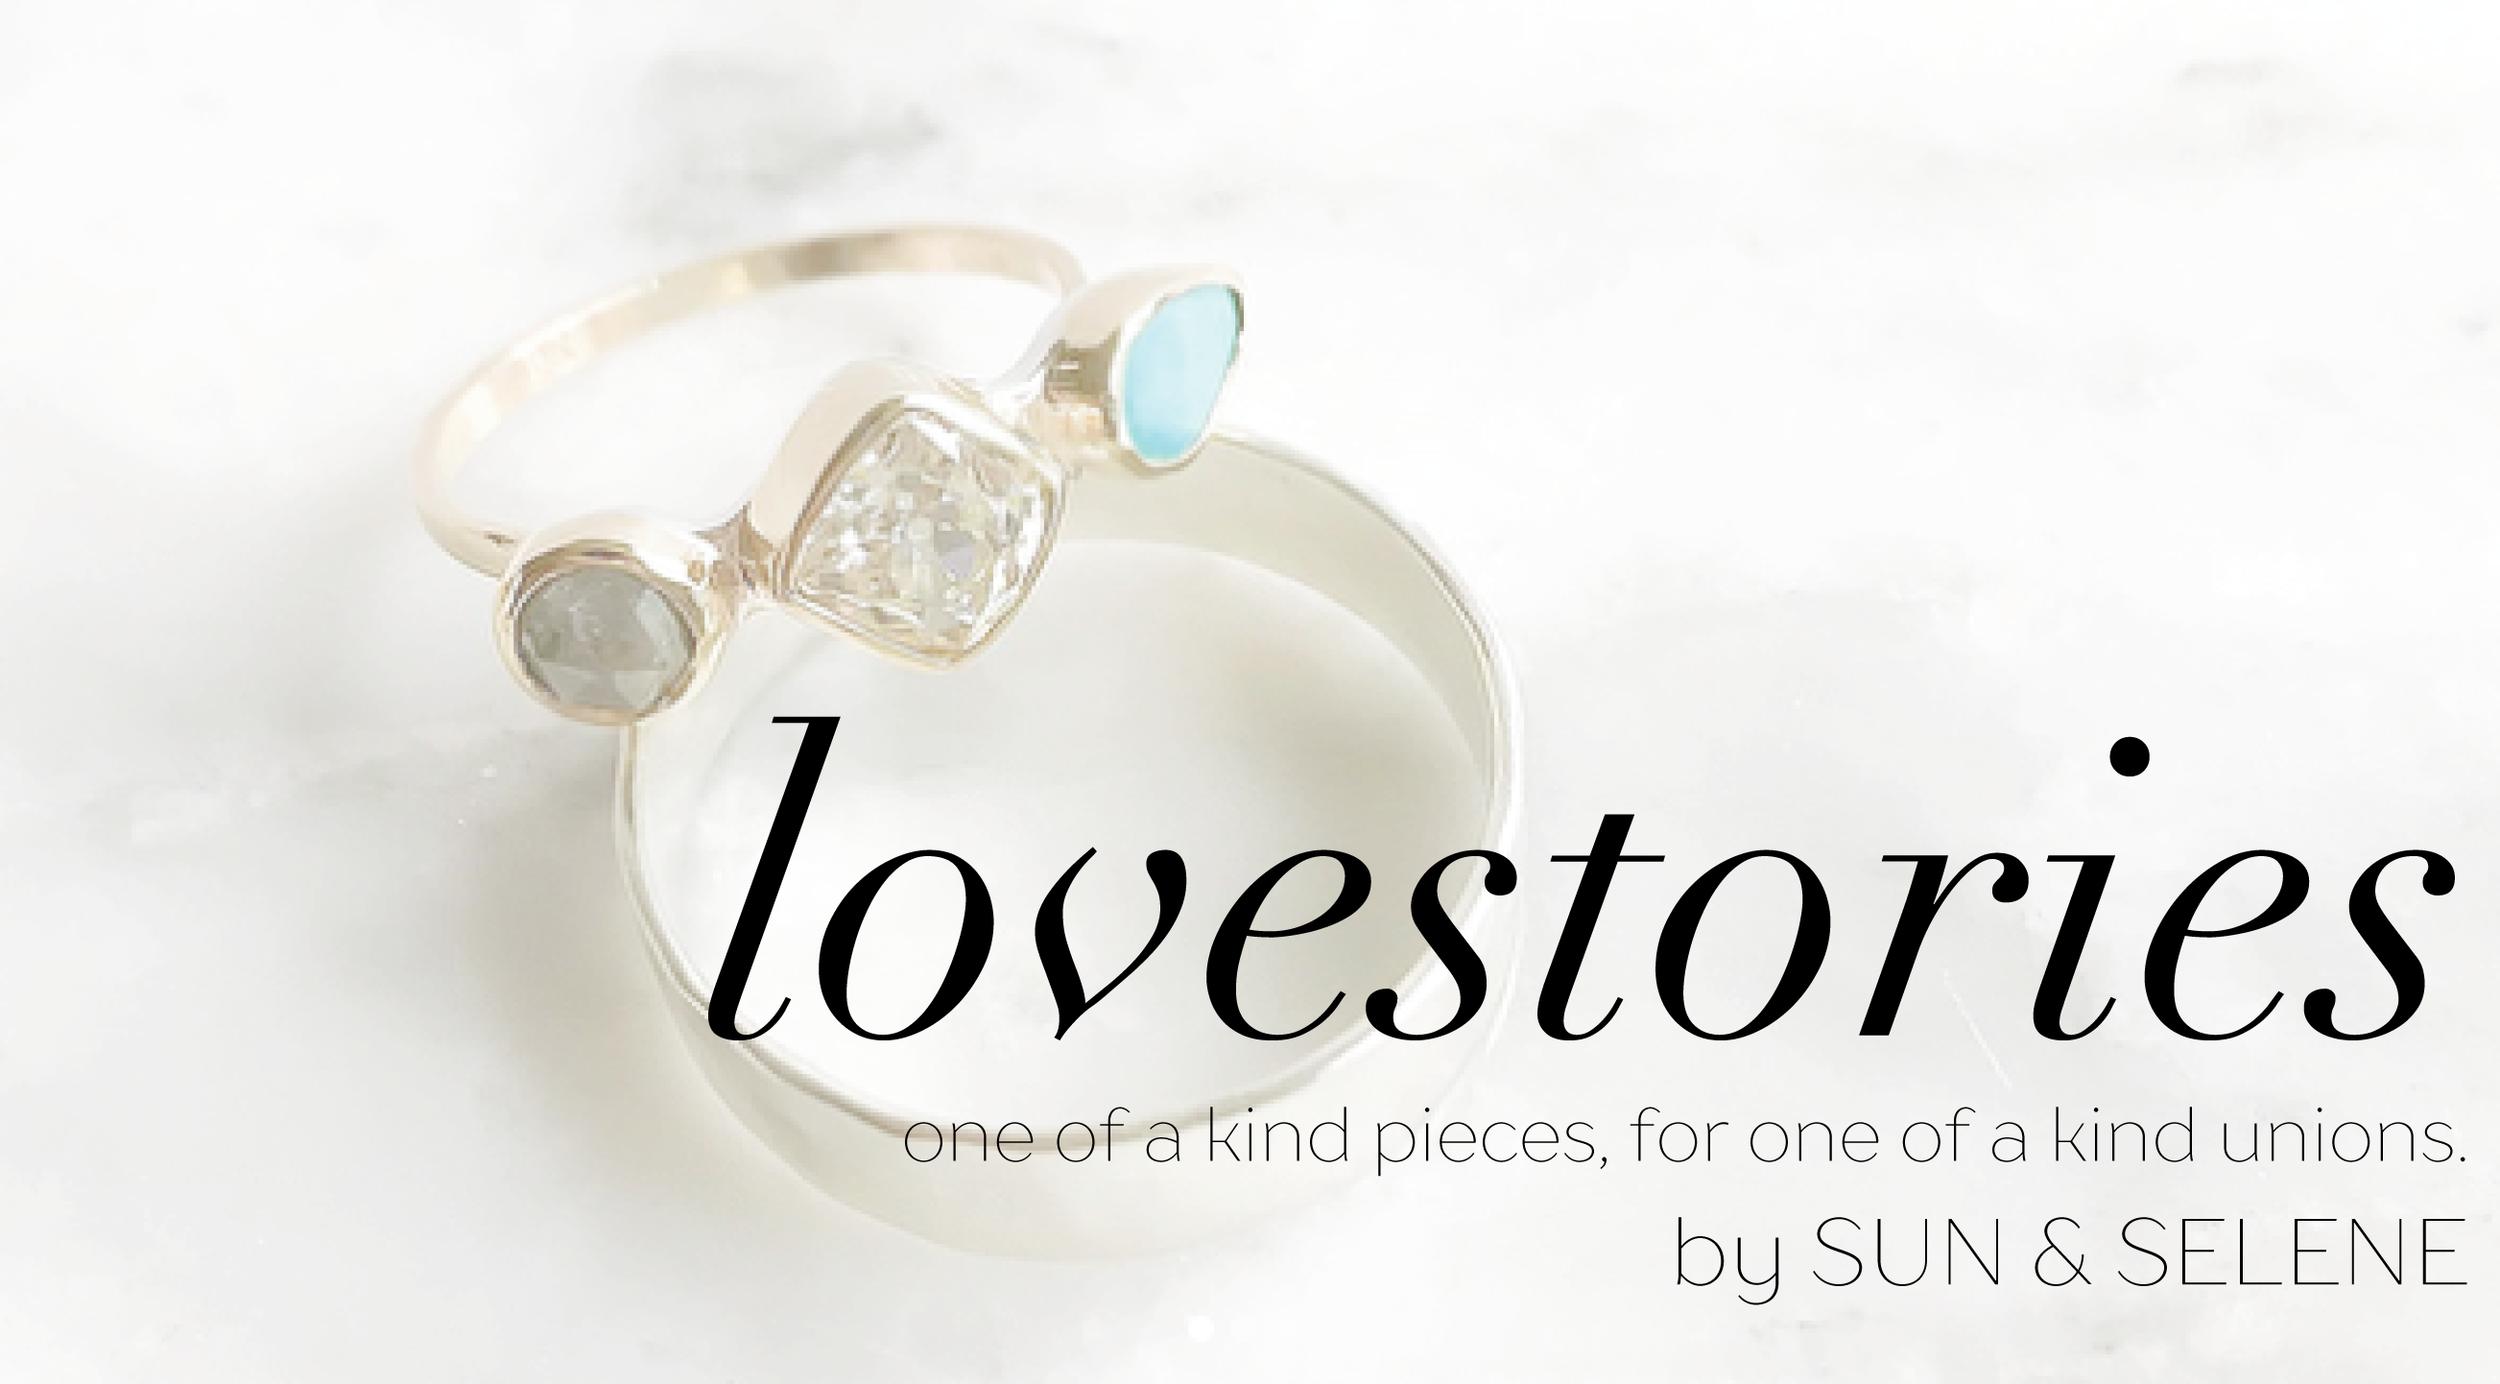 Lovestoriesheader-01.png